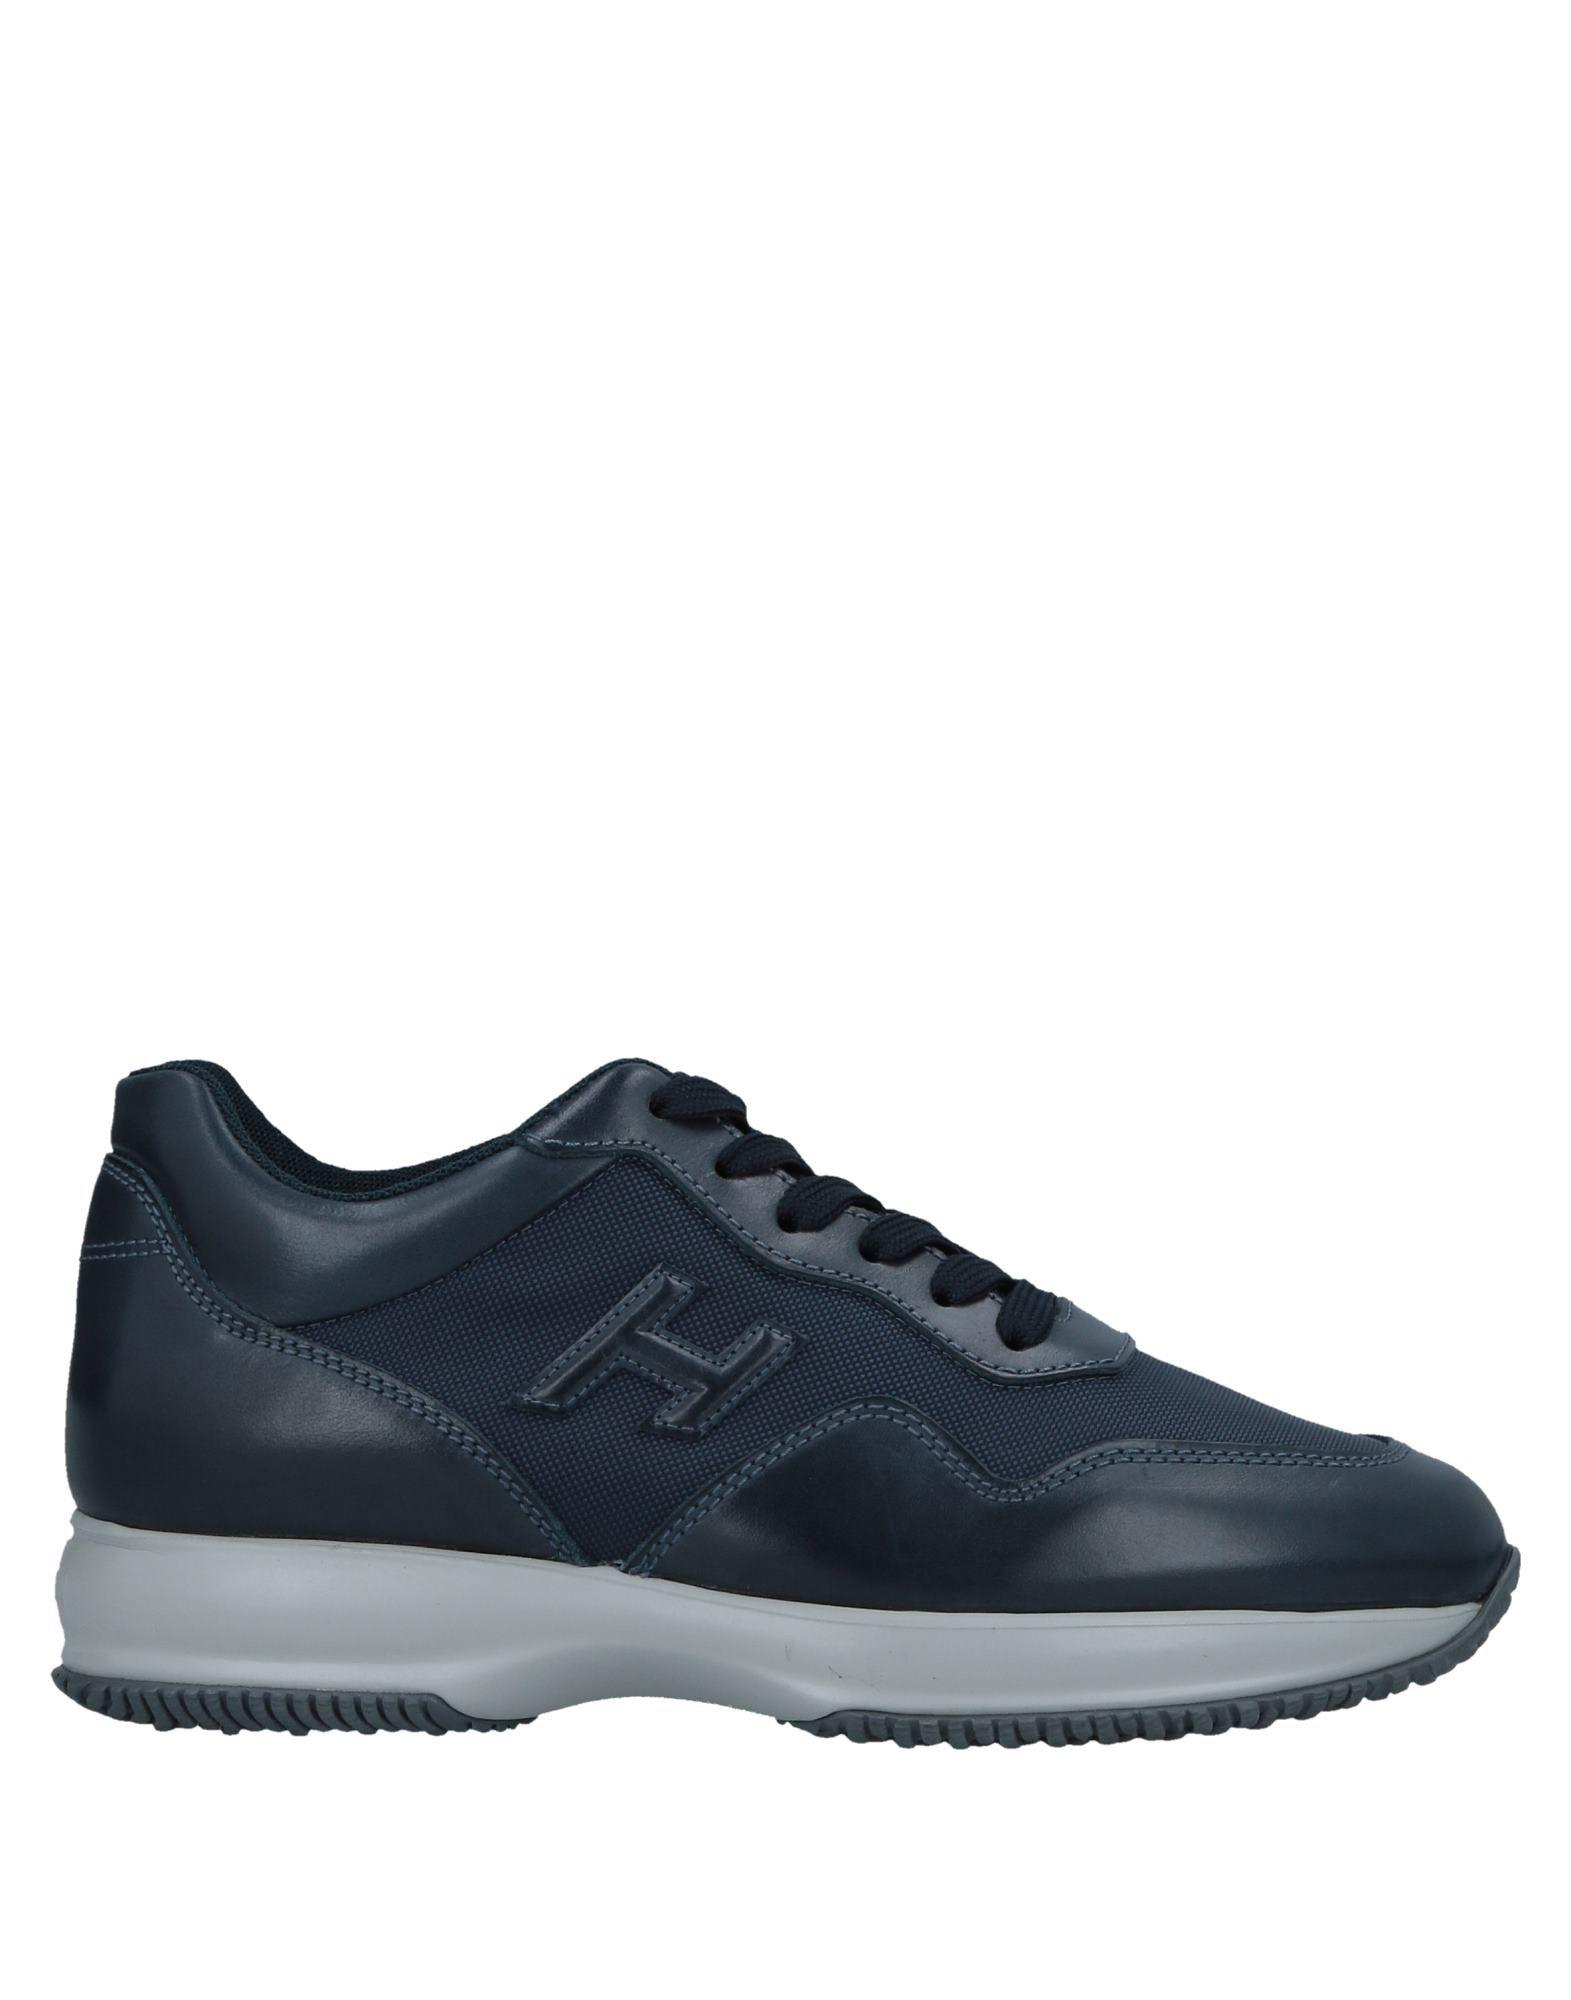 Hogan Sneakers Herren  11534477GK Gute Qualität beliebte Schuhe